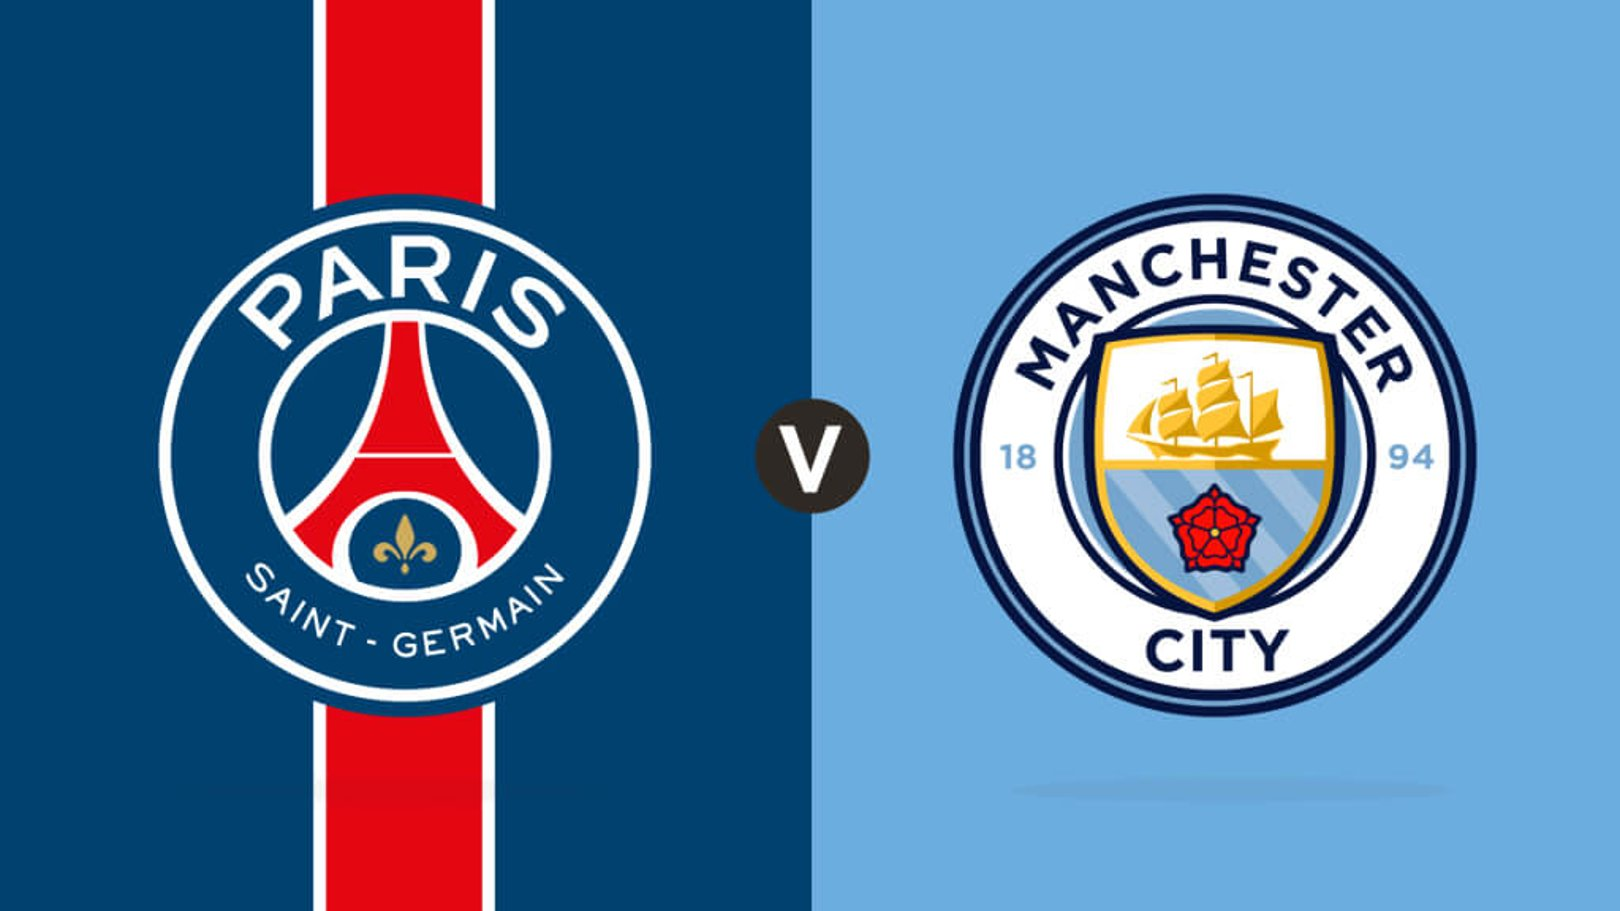 Paris Saint-Germain v Man City: en directo